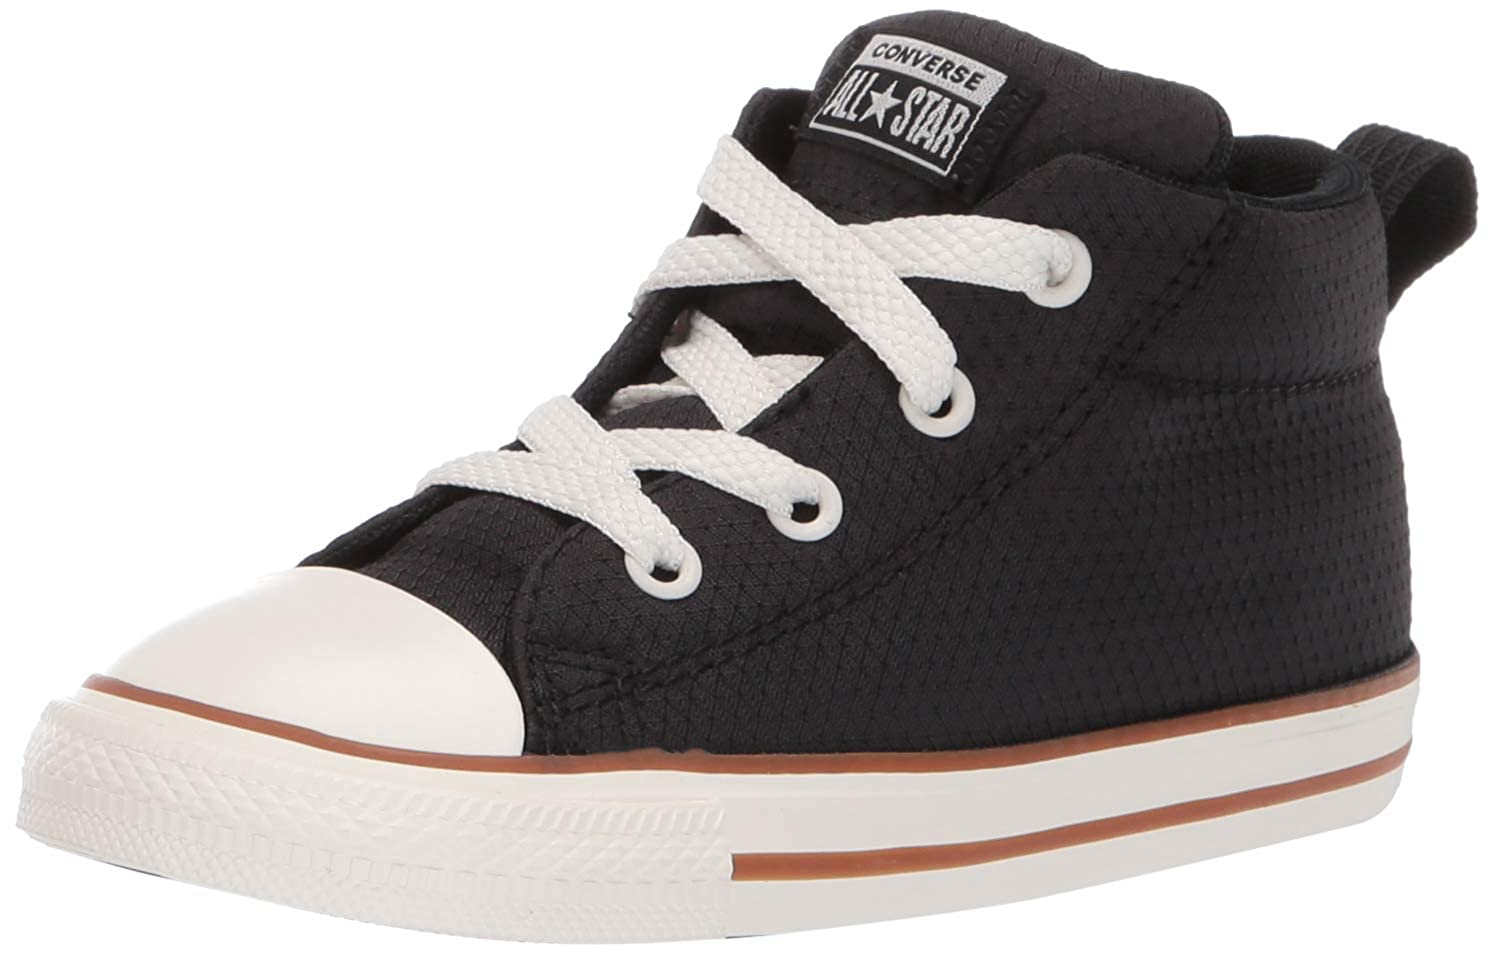 Converse Kids Infants' Chuck Taylor All Star Street Pinstripe Mid Top Sneaker